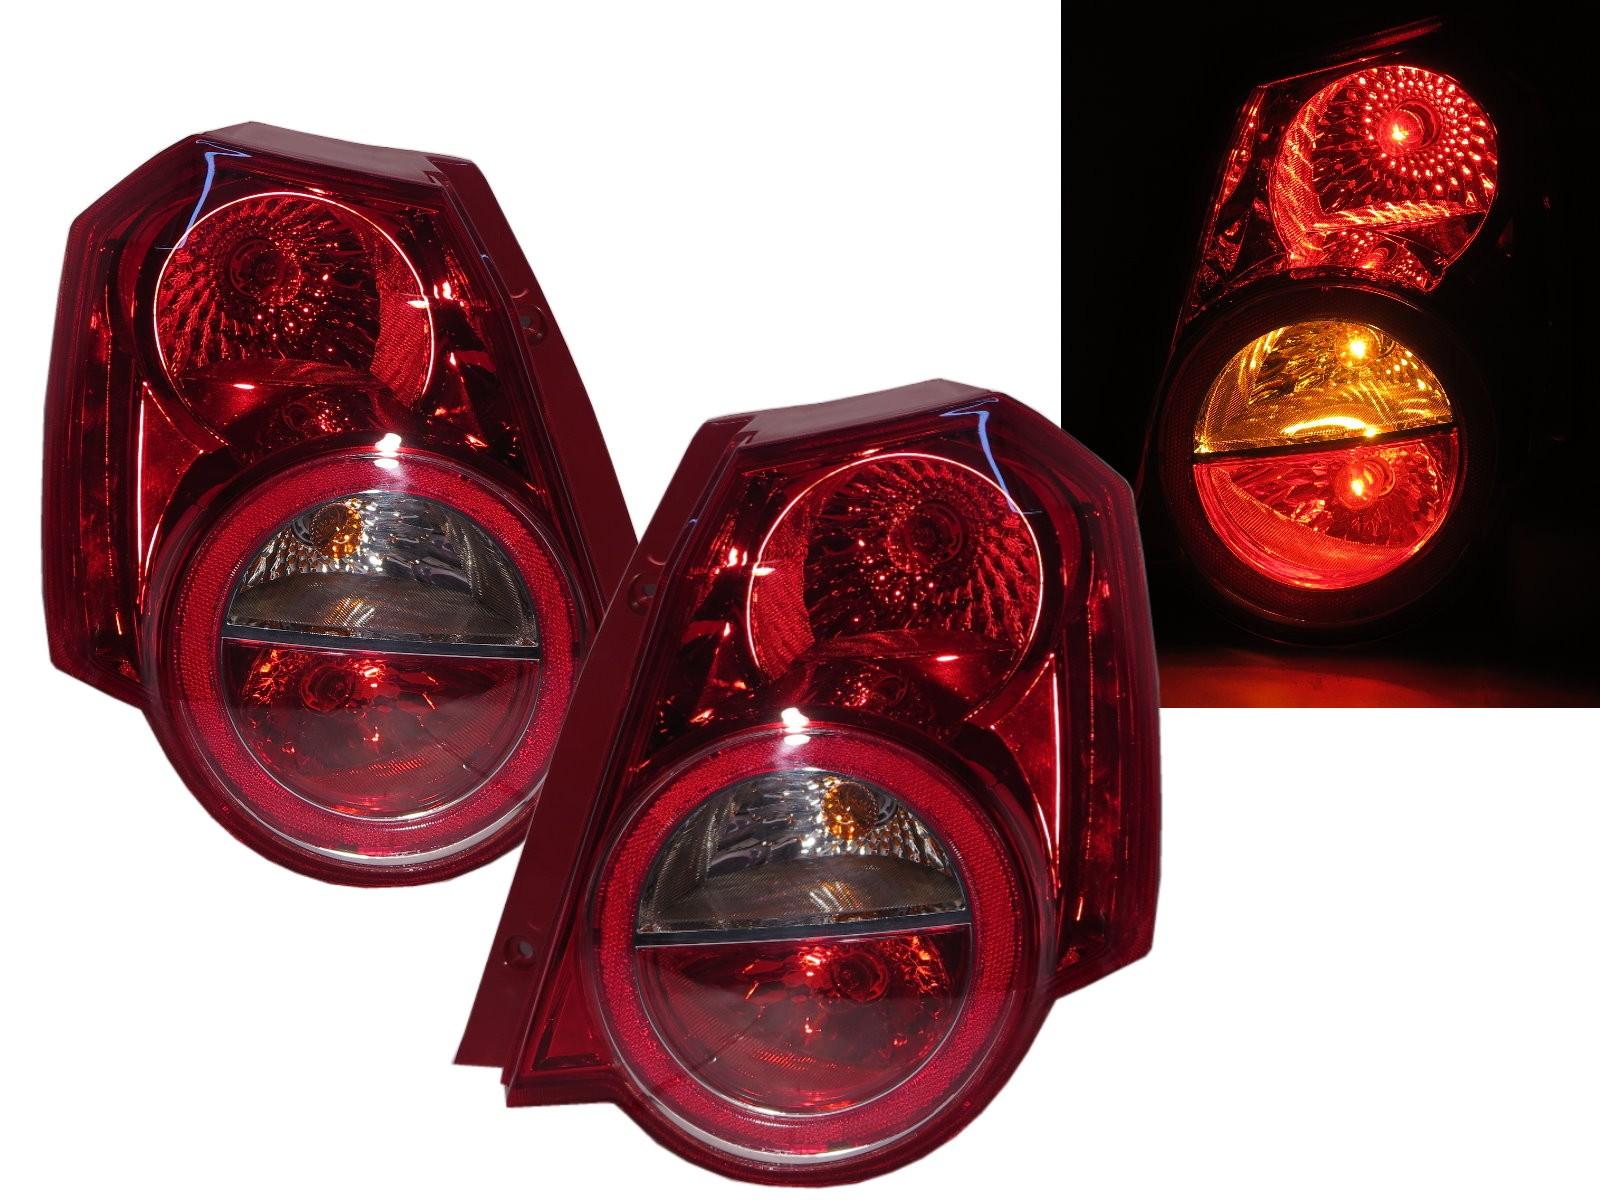 CrazyTheGod Gentra X 2009-2011 FACELIFT Hatchback 3D/5D Clear Tail Rear Light Red for DAEWOO